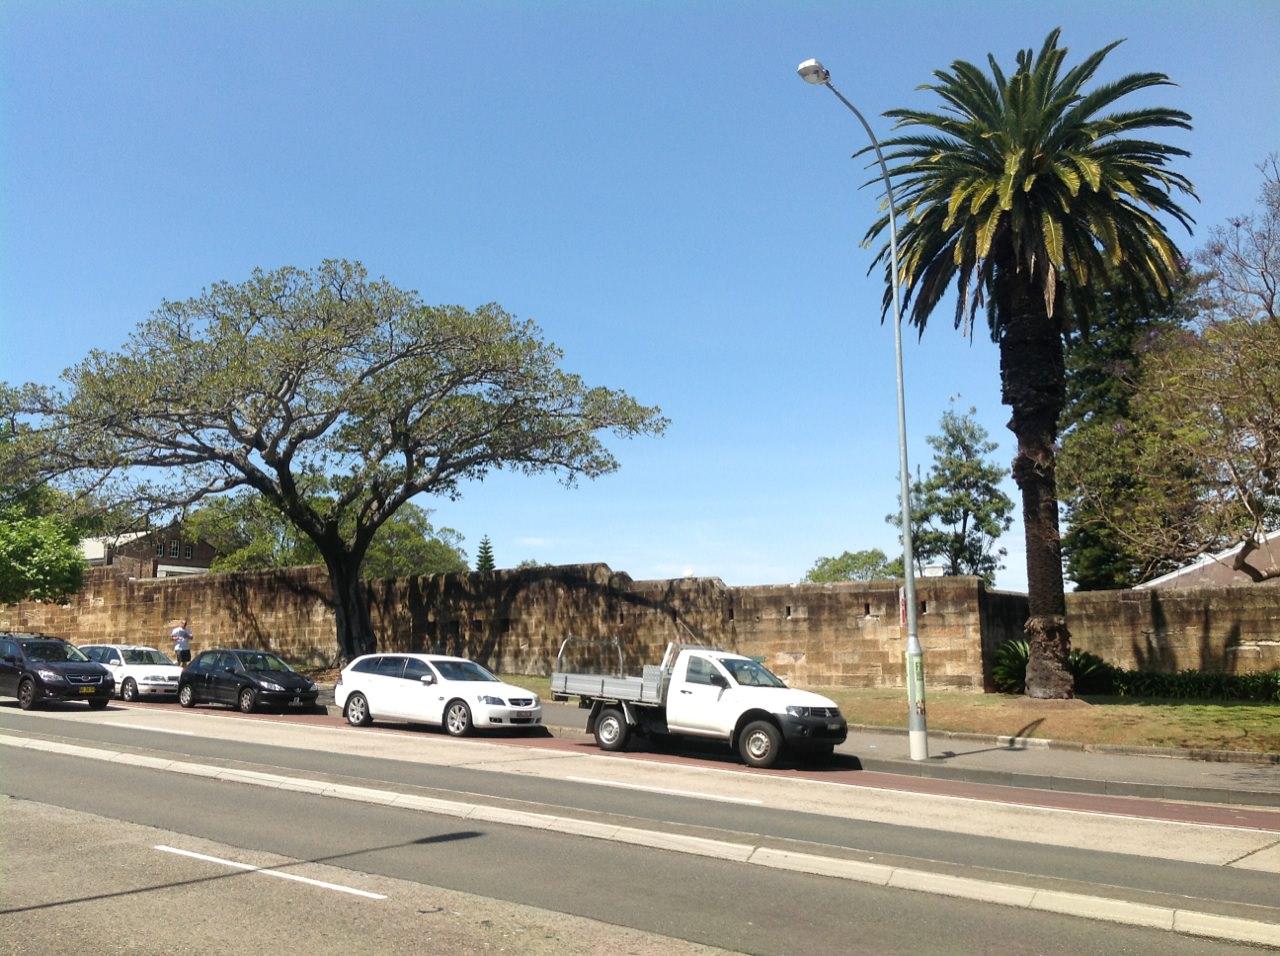 Moreton Bay Fig and Canary Island Date Palm